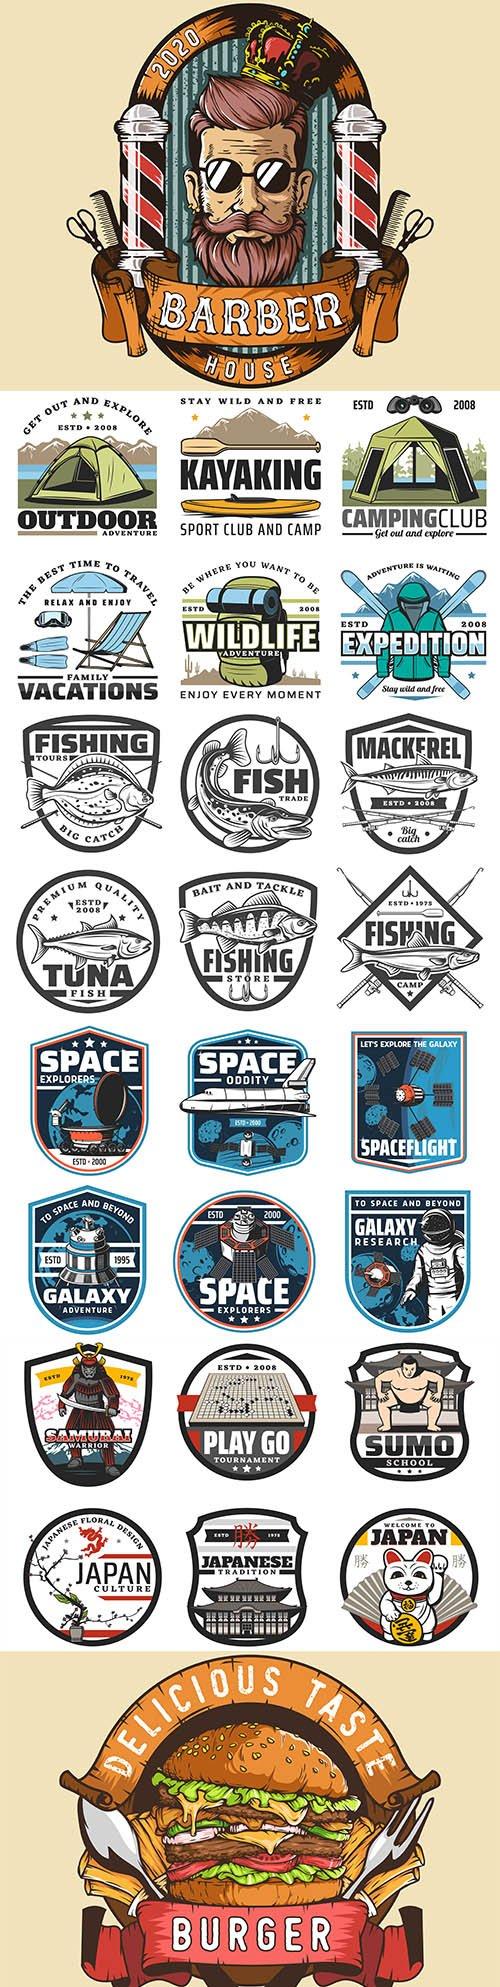 Brand name company logos business corporate design 10